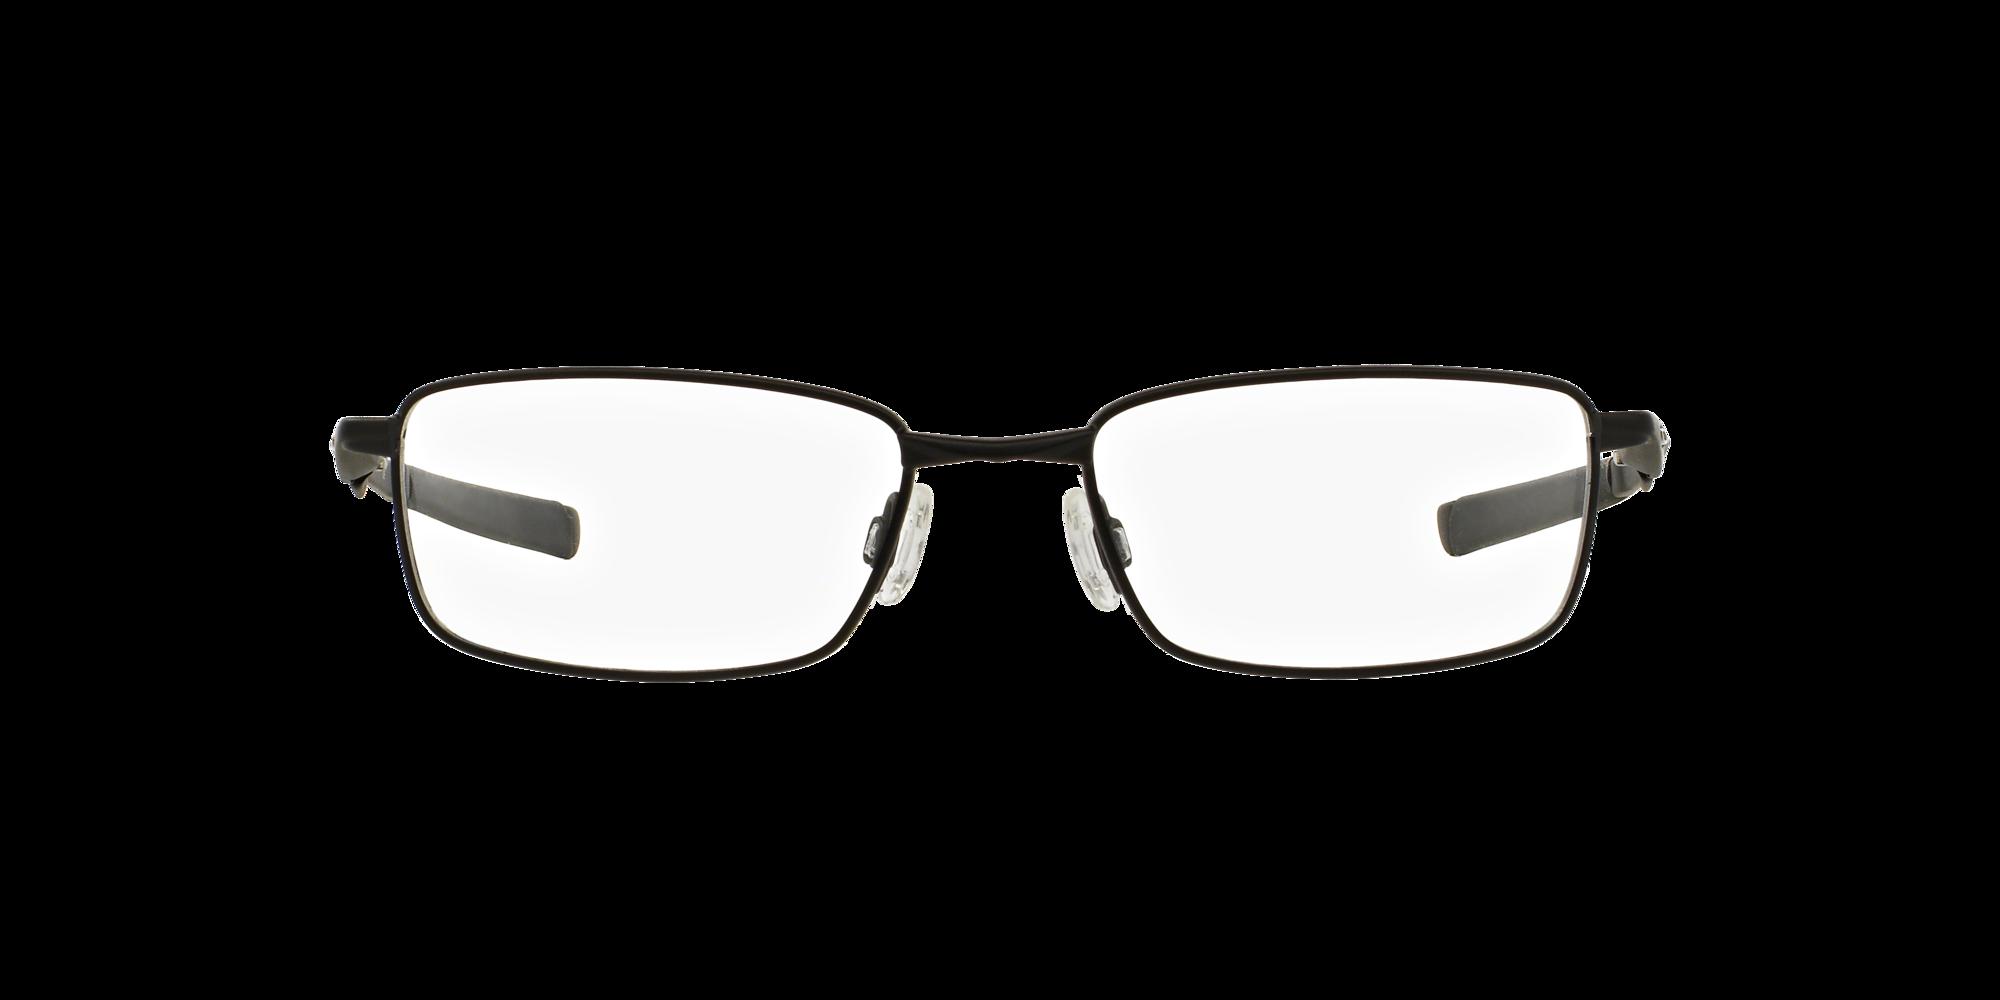 Image for OX3009 BOTTLE ROCKET from LensCrafters | Glasses, Prescription Glasses Online, Eyewear